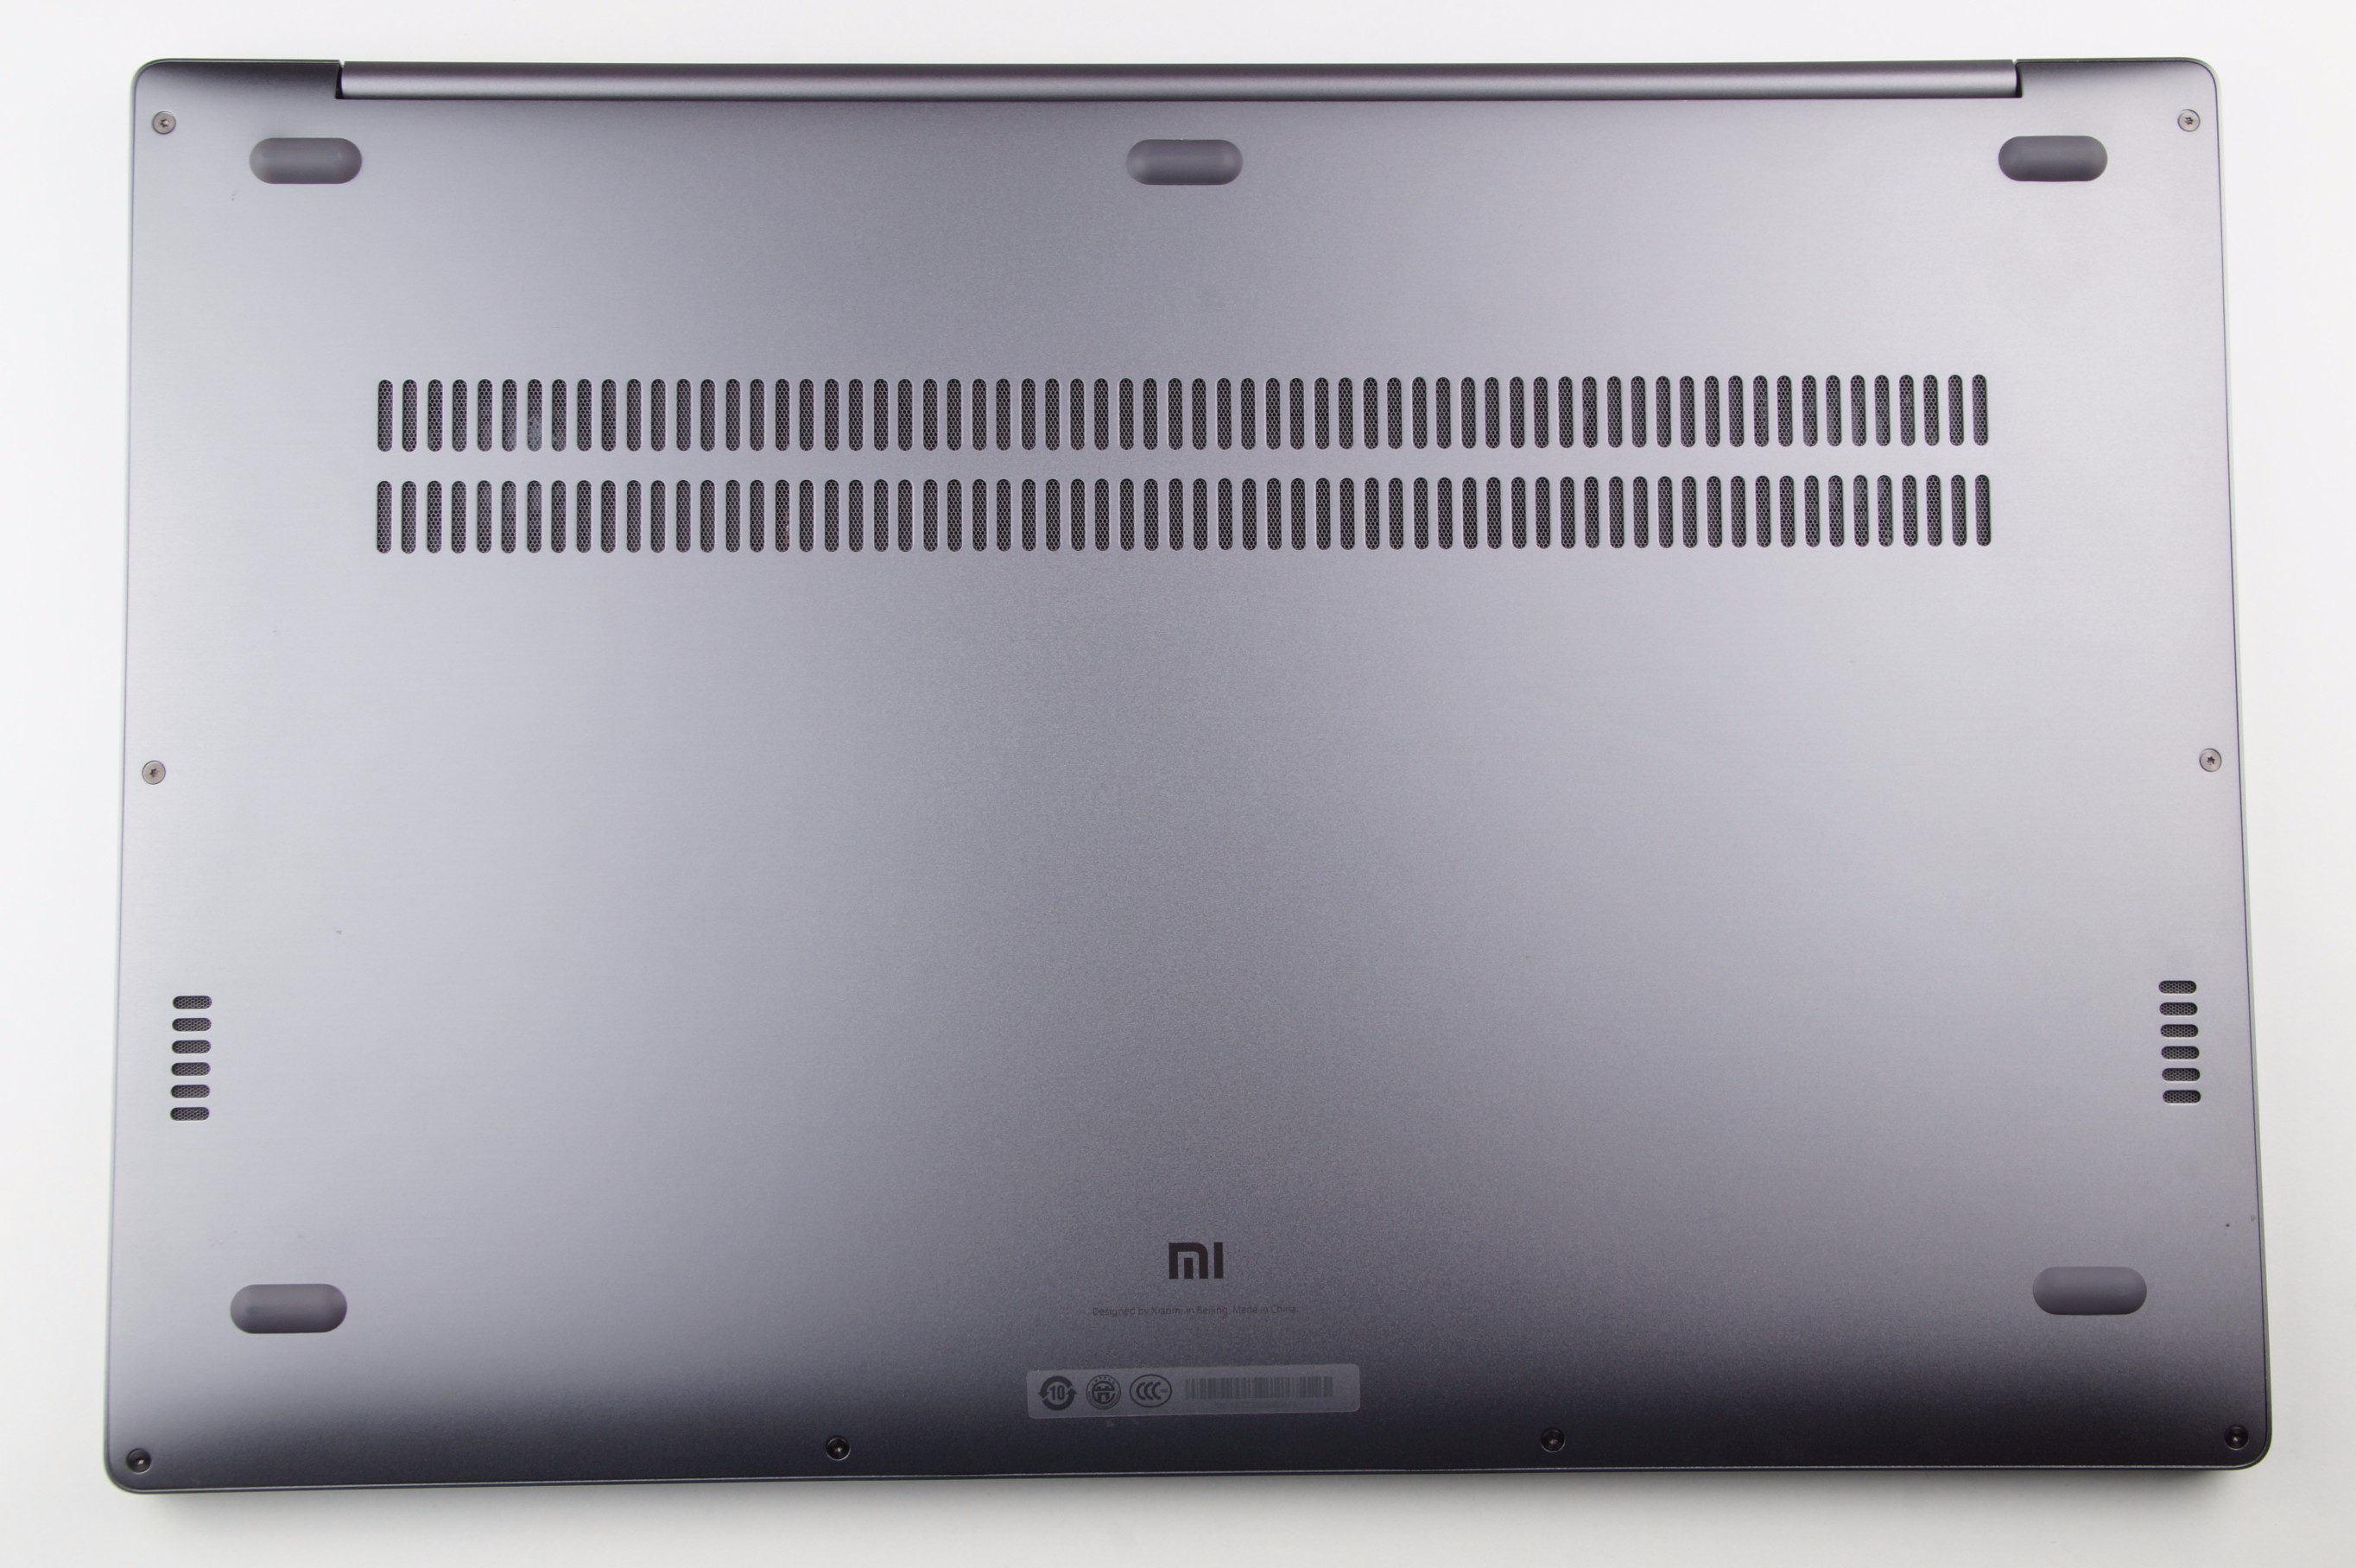 Xiaomi Mi Notebook Pro 1 12